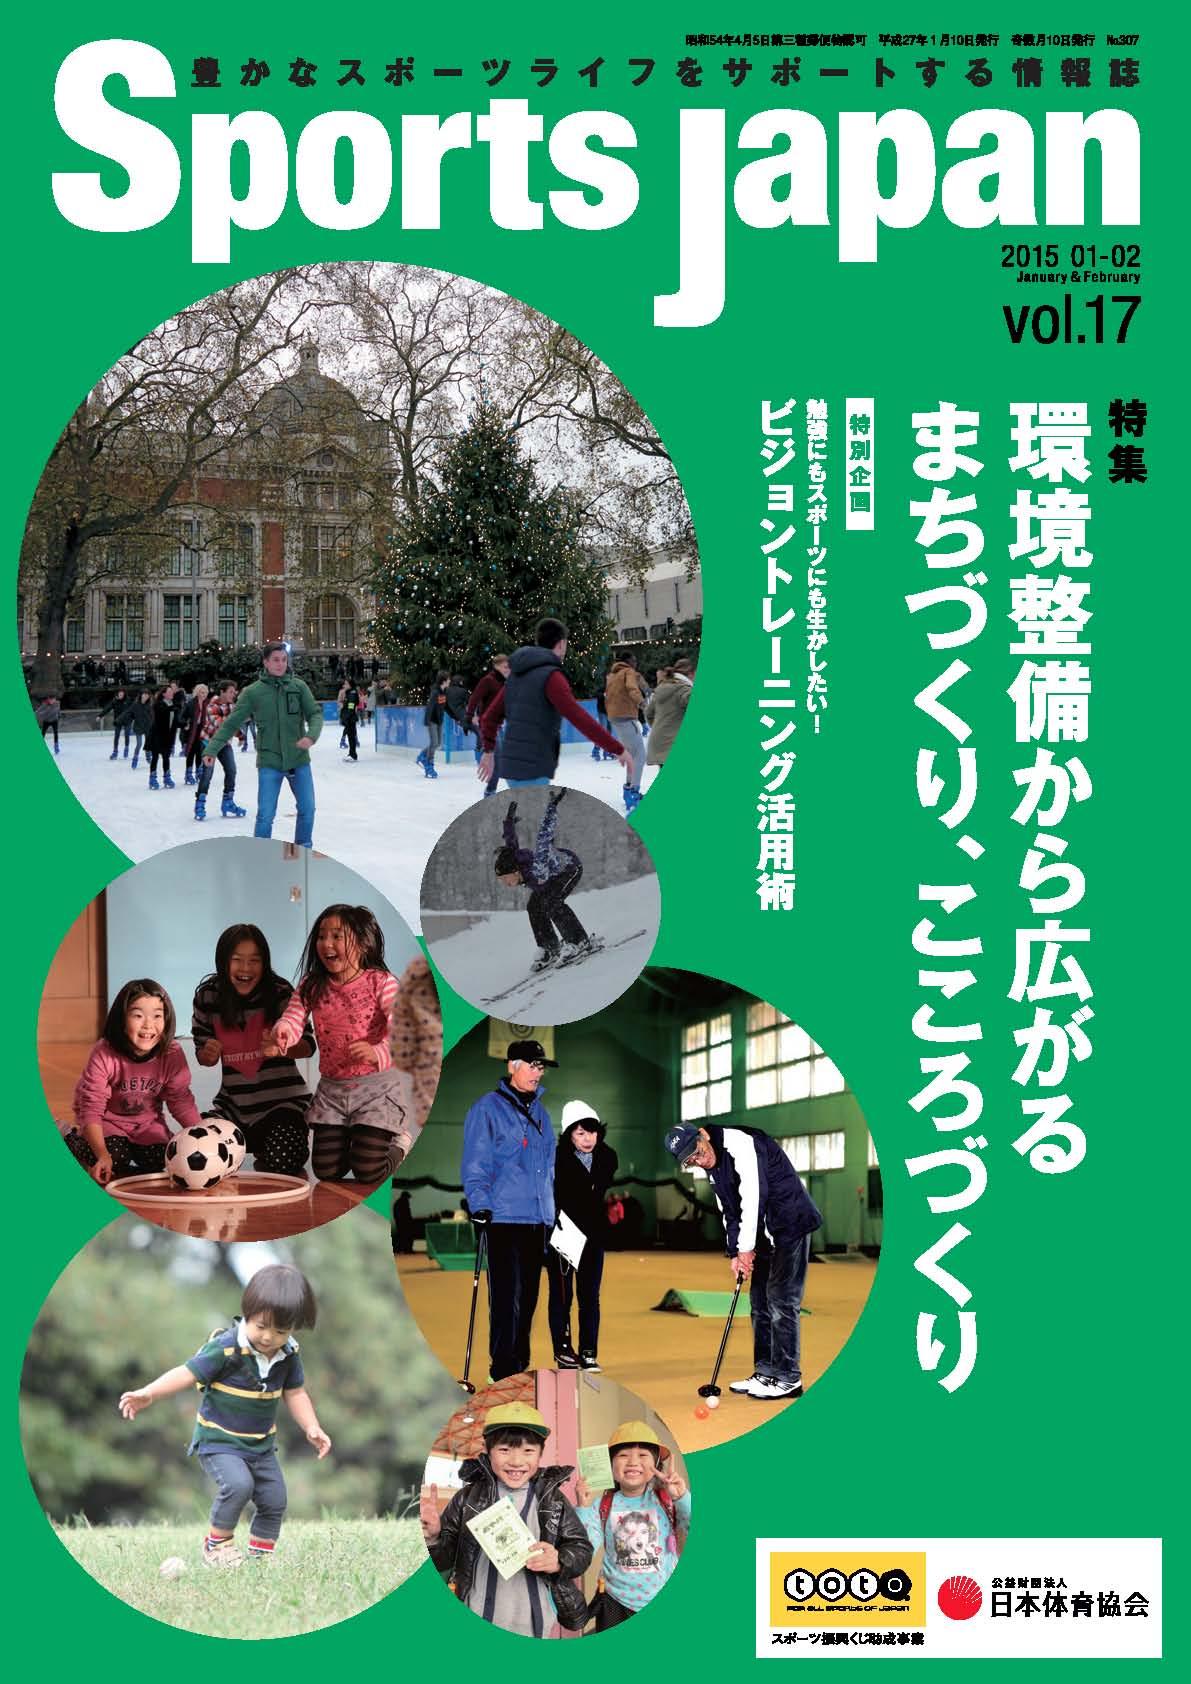 SportsJapan vol17表紙1